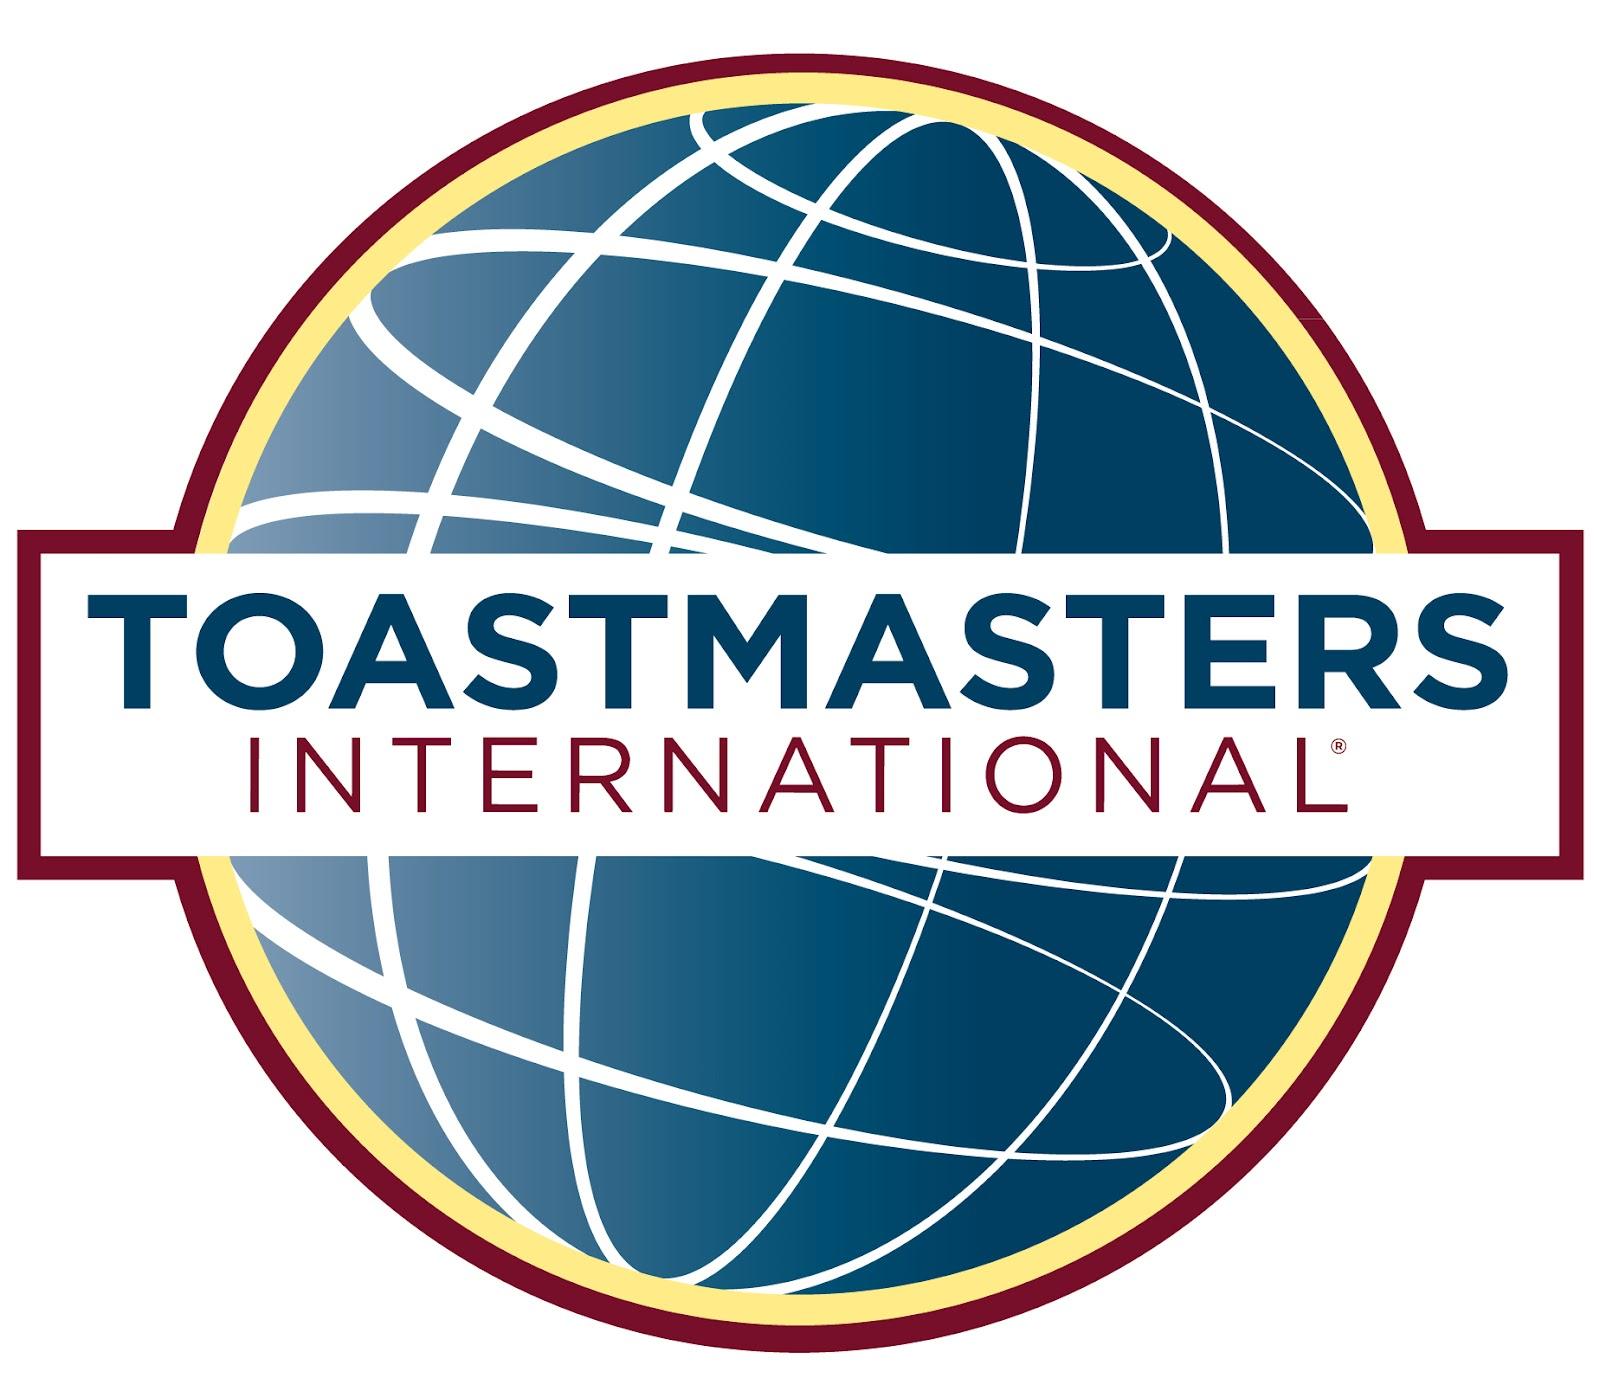 faith toastmasters club toastmasters benefits my photo faith toastmasters club website singapore